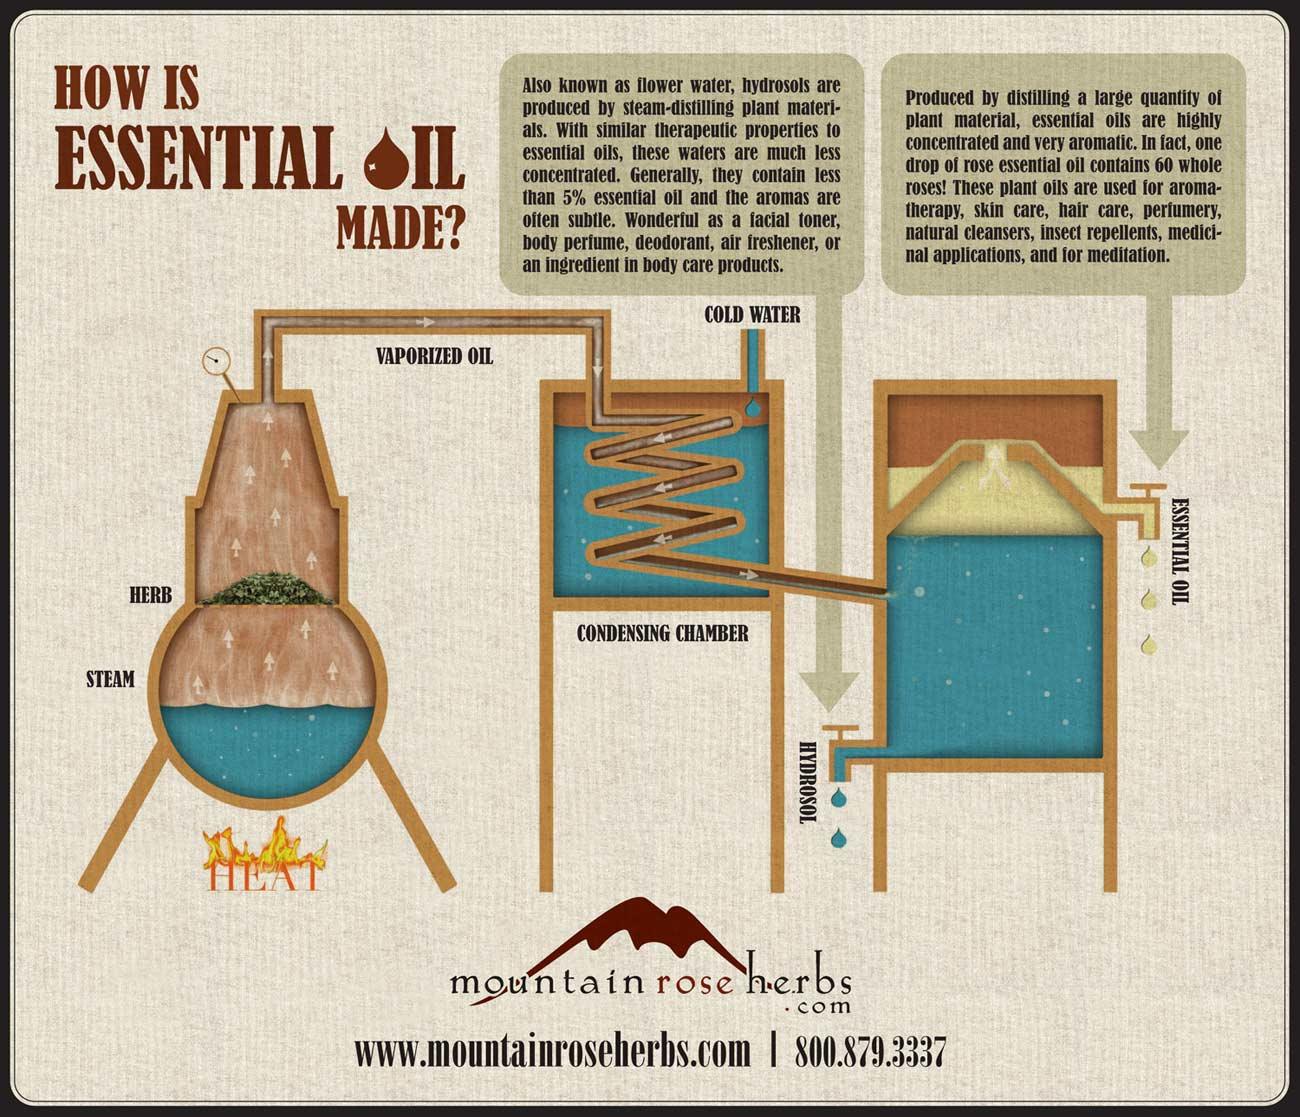 Essential Oil Infographic